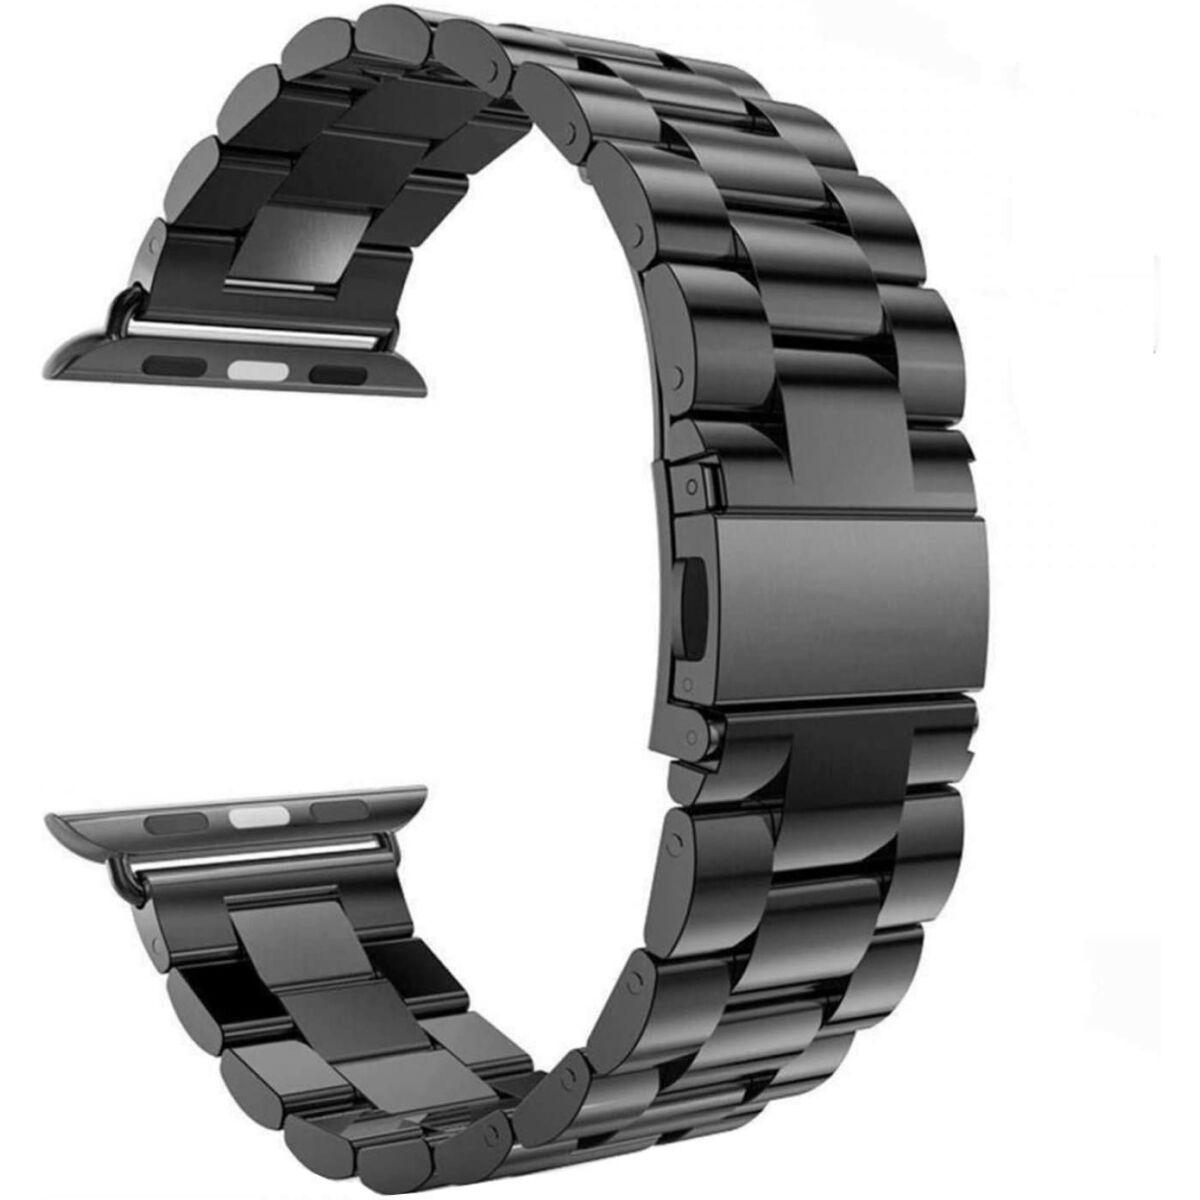 Ringke Apple Watch óraszíj 42 mm/44 mm, Metal One Stainless Steel, Fekete